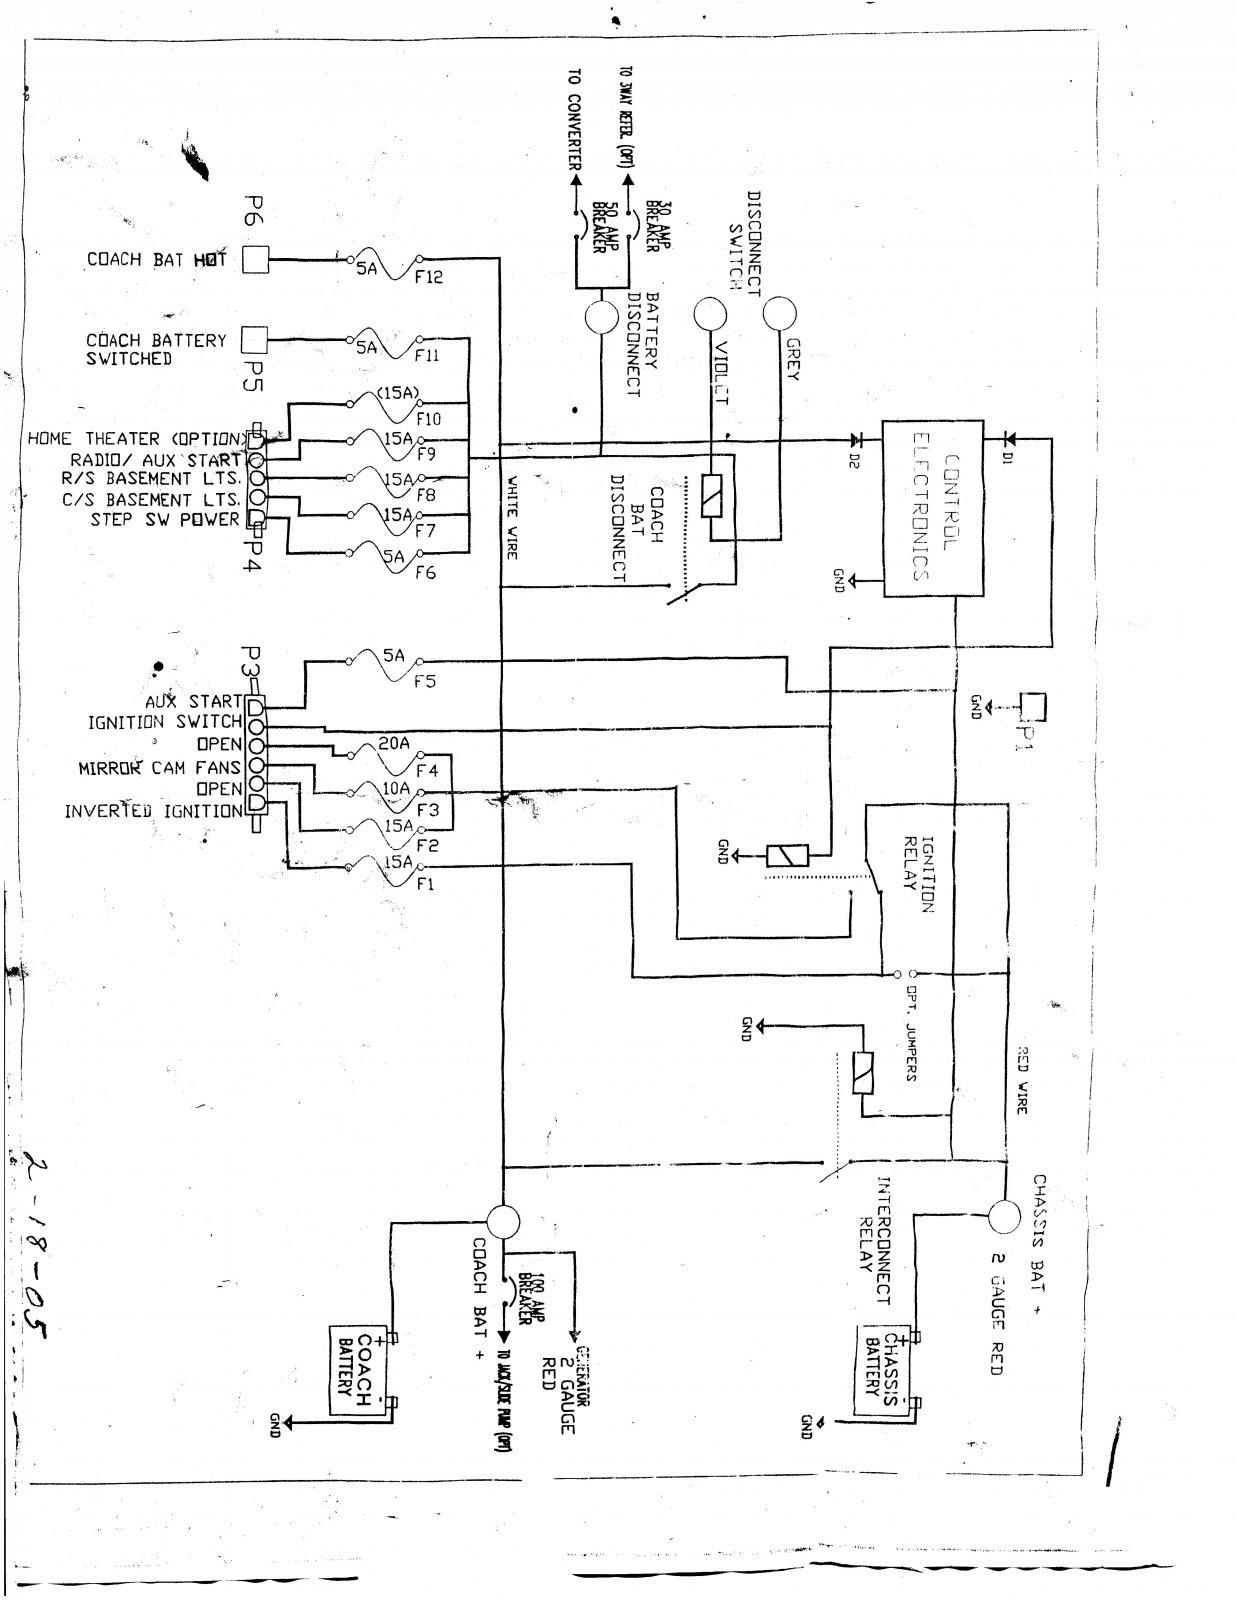 jayco wiring diagram jayco wiring diagrams jayco wiring diagram caravan wire diagram